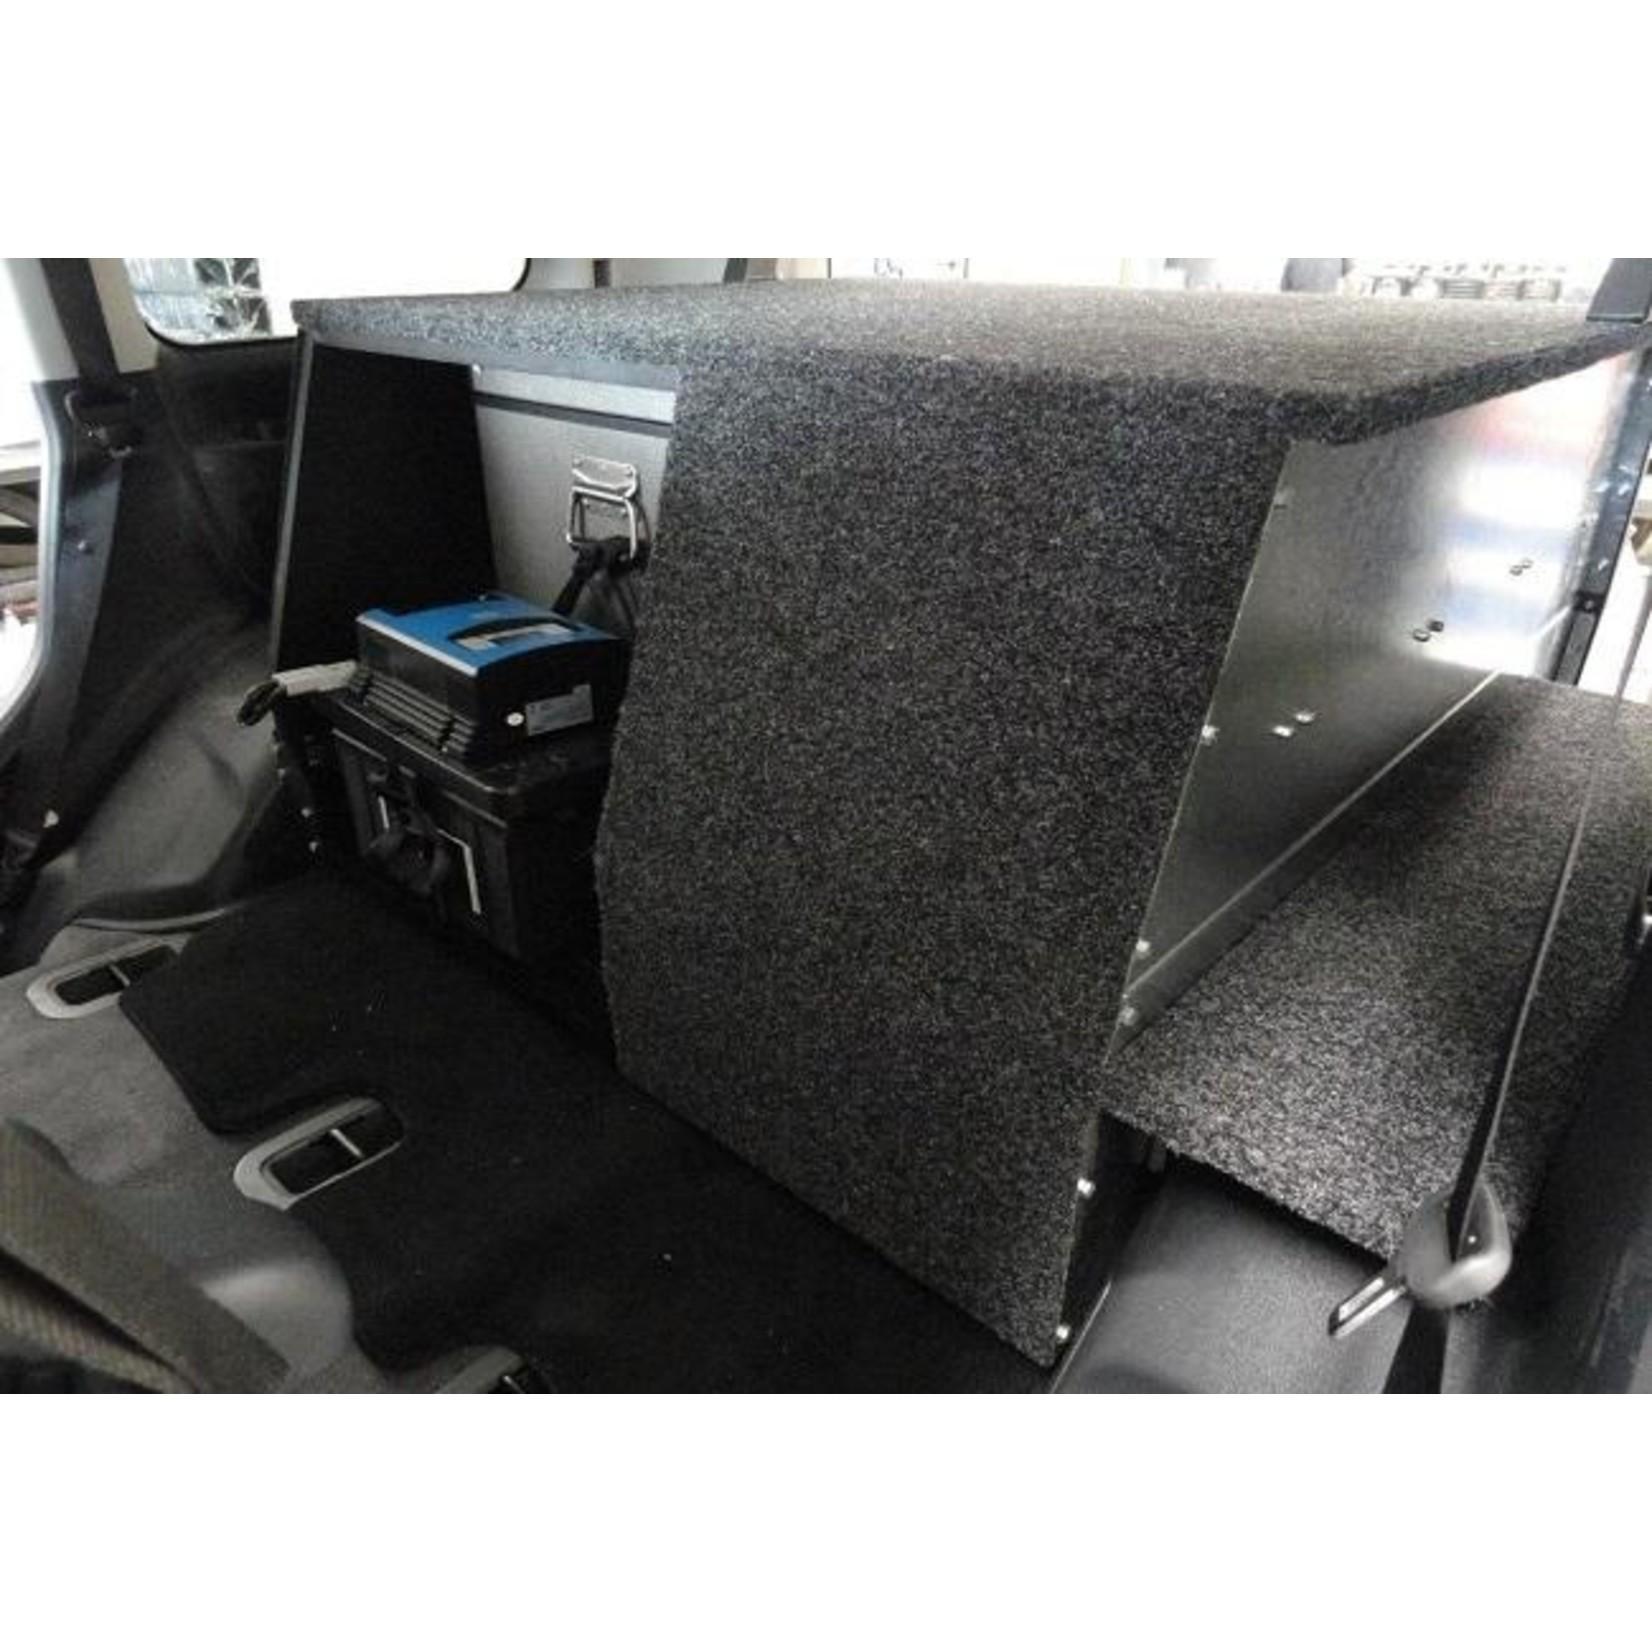 Big Country 4x4 Big Country 4x4 Toyota Land Cruiser 200/Lexus LX570 Combo Drawer Kit